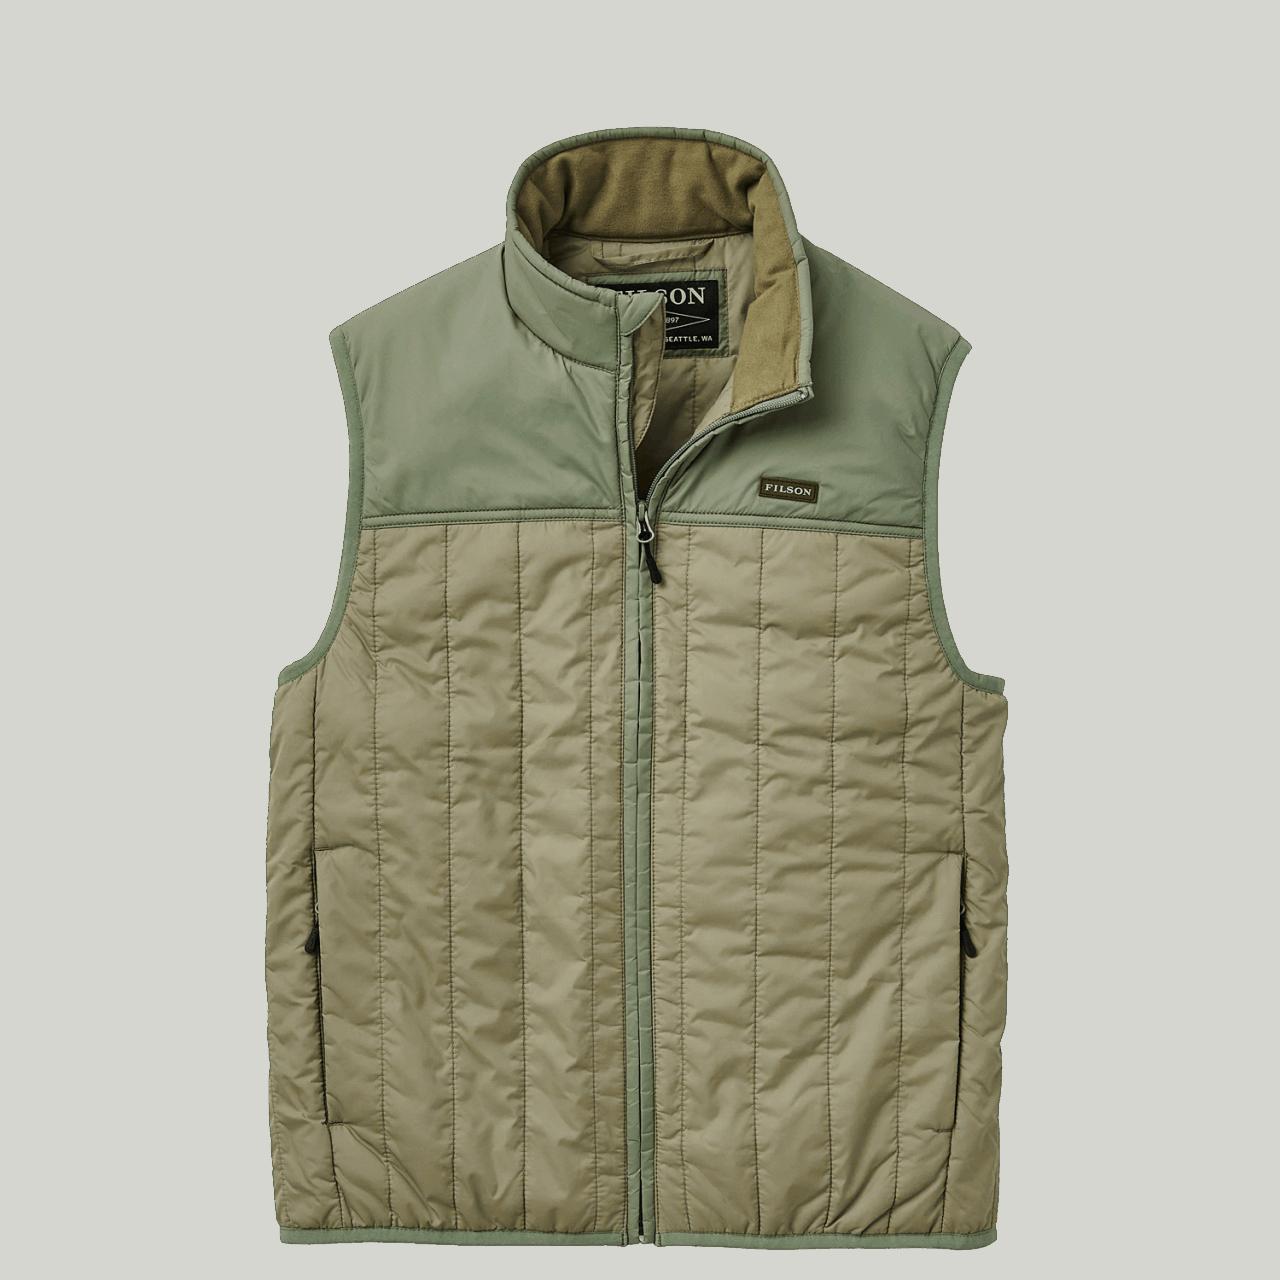 Filson Ultra Light Vest - olive branch / green